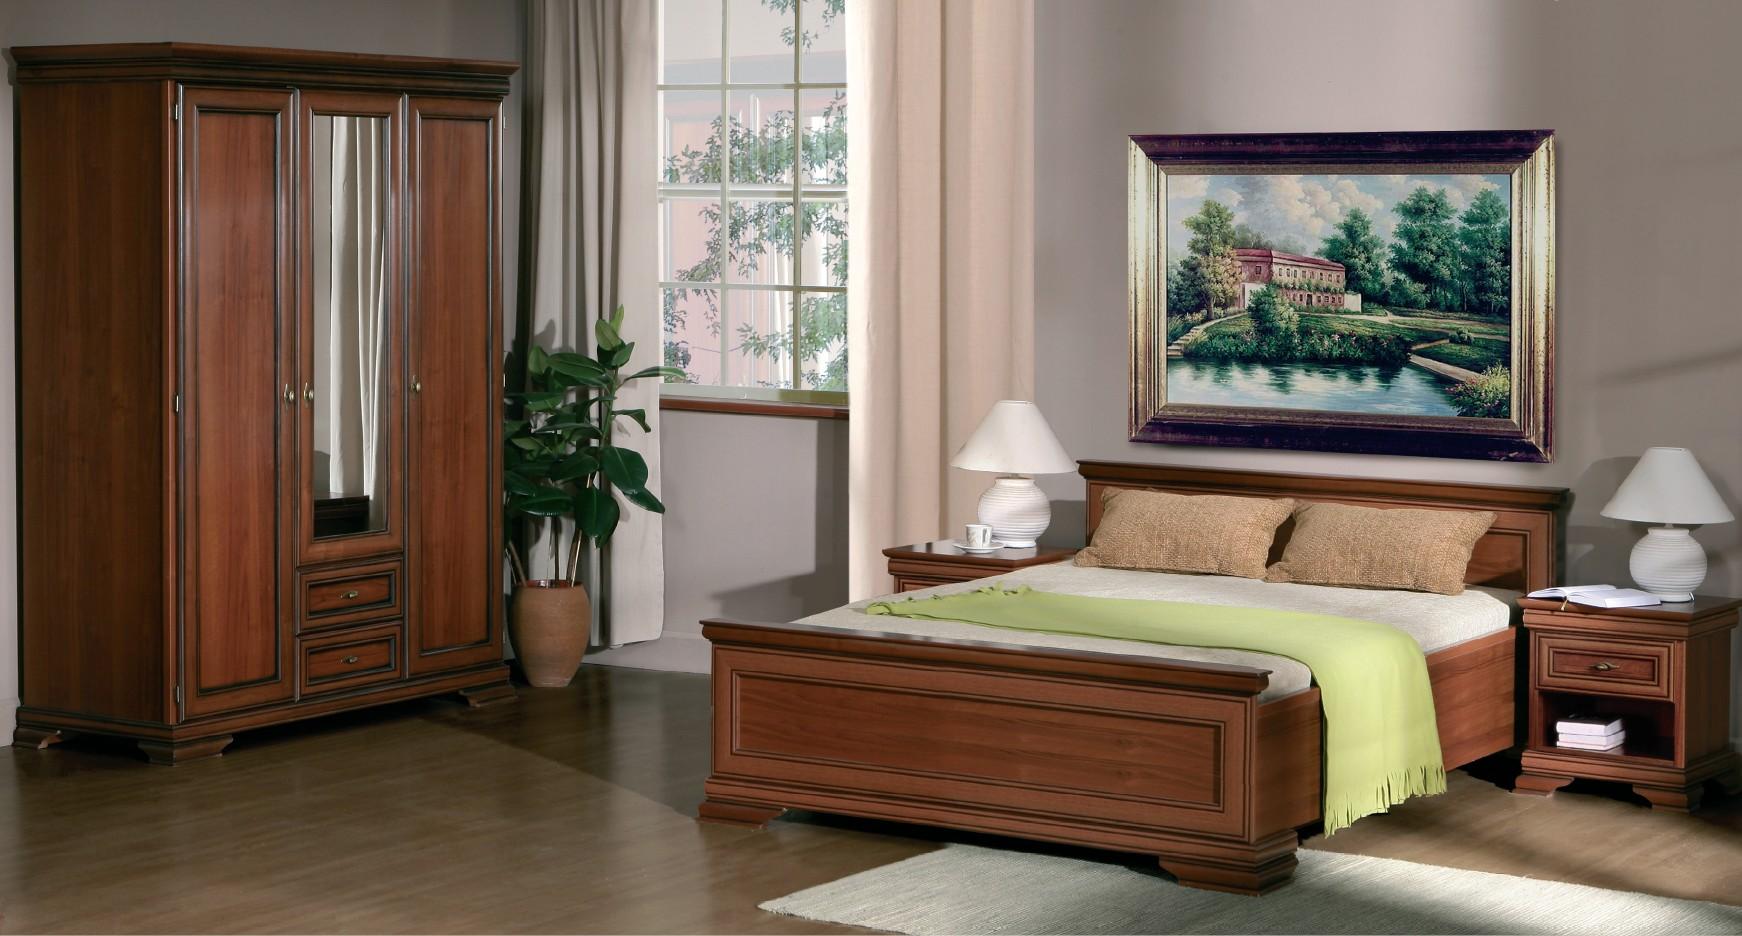 moebel24 aramis schlafzimmer komplett einrichtung ii ebay. Black Bedroom Furniture Sets. Home Design Ideas